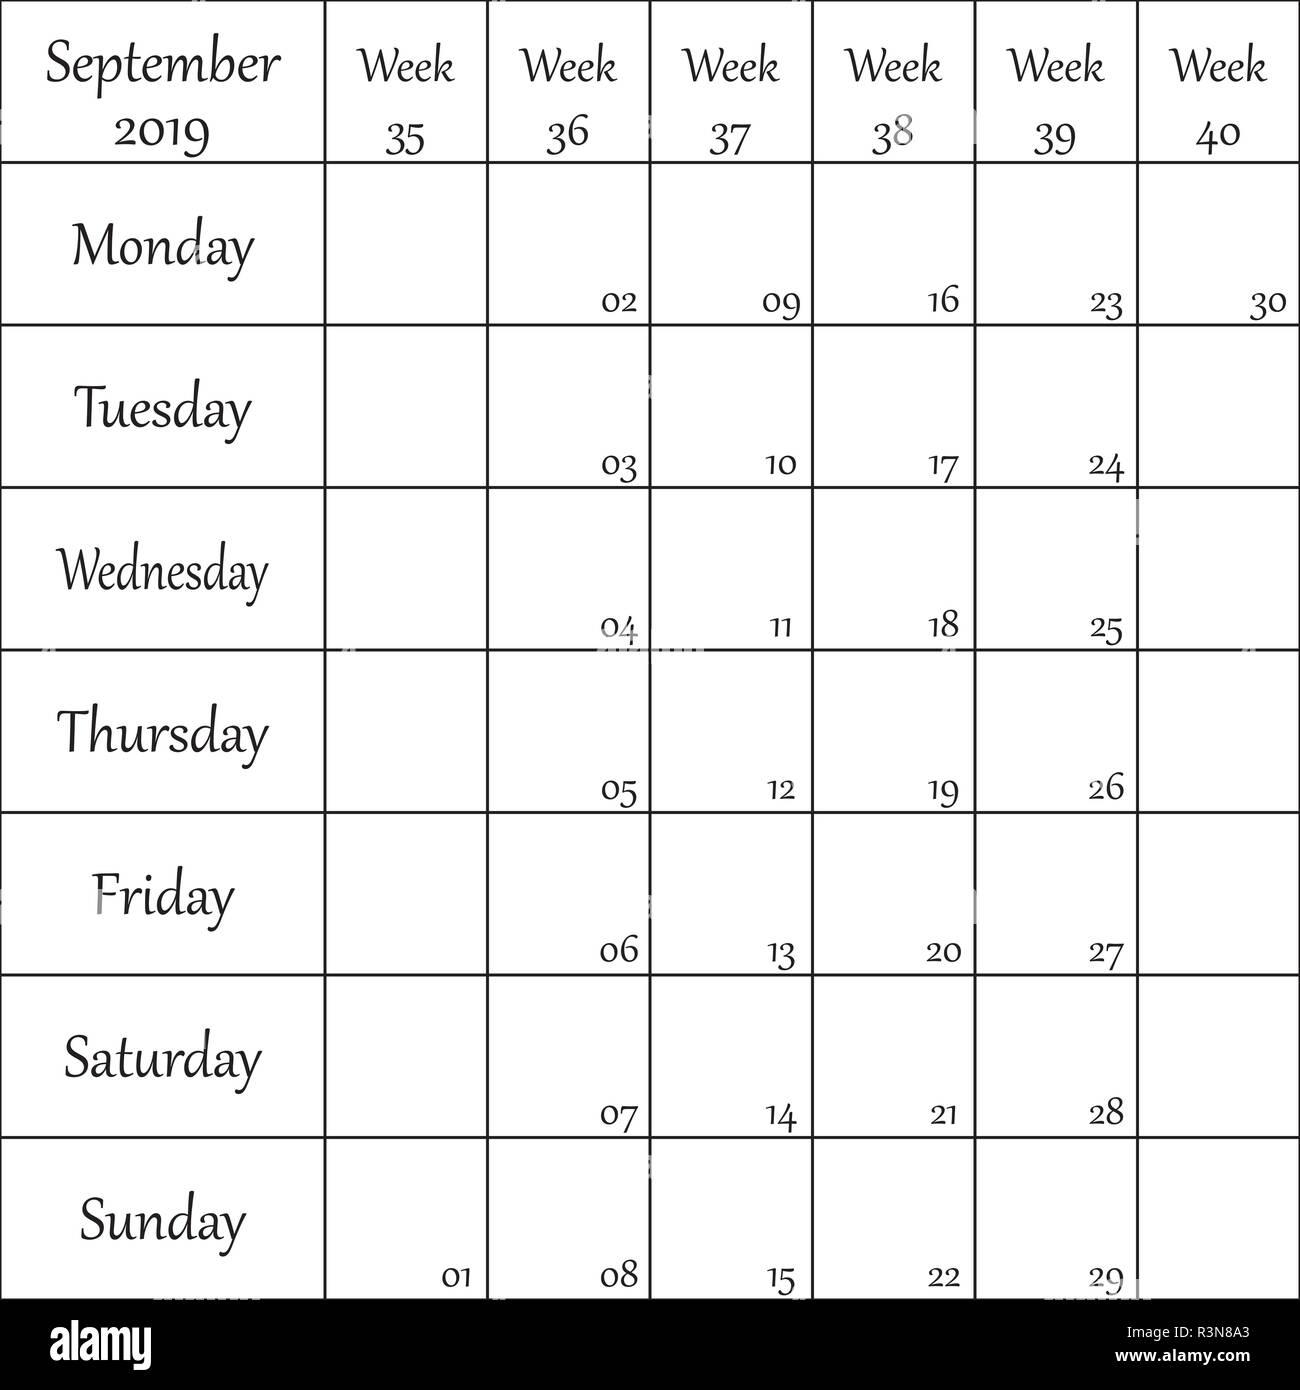 September 2019 Planner with number for each Weak - Stock Vector